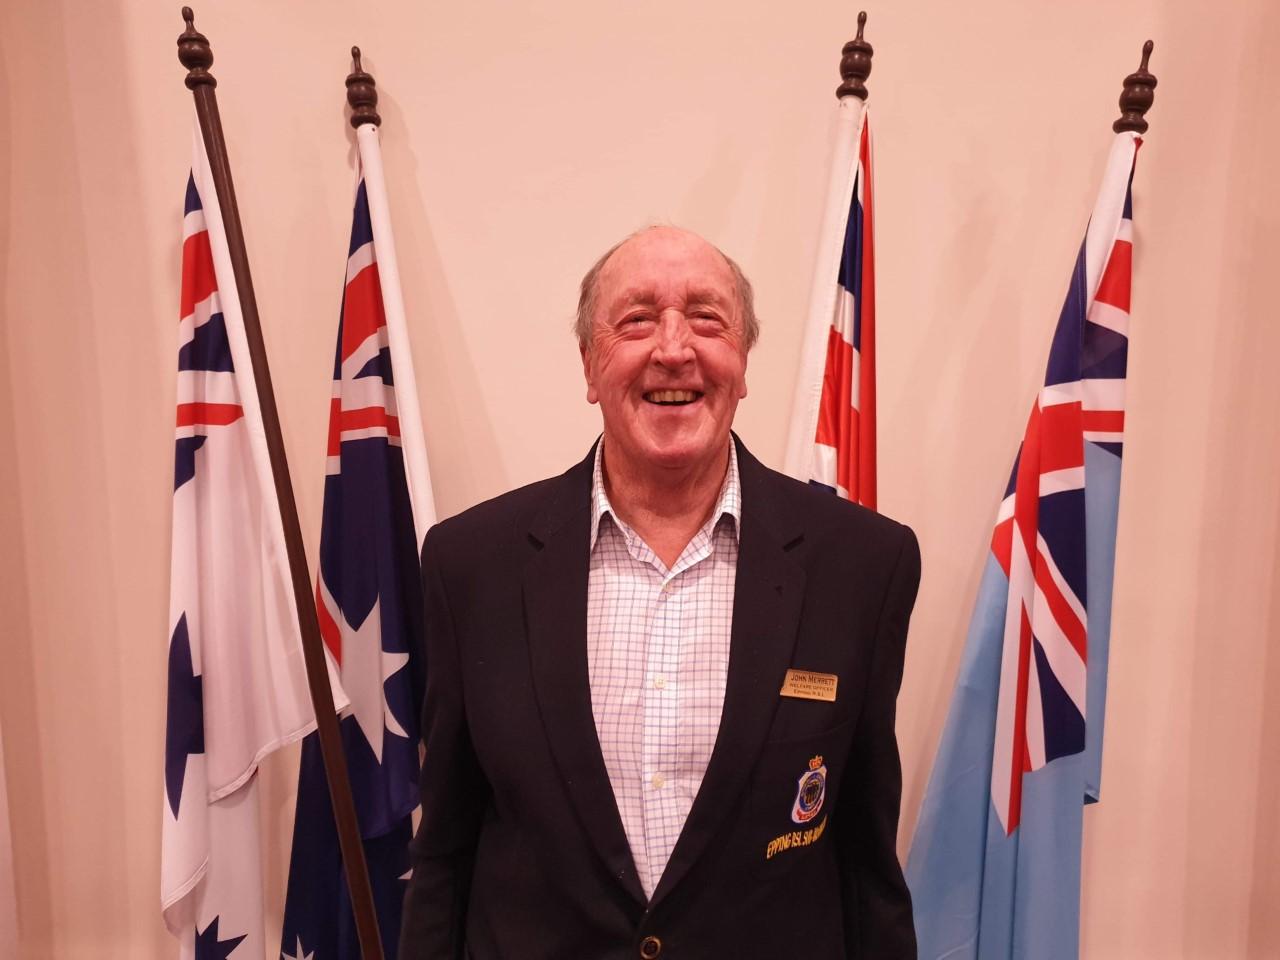 Mr John Merrett